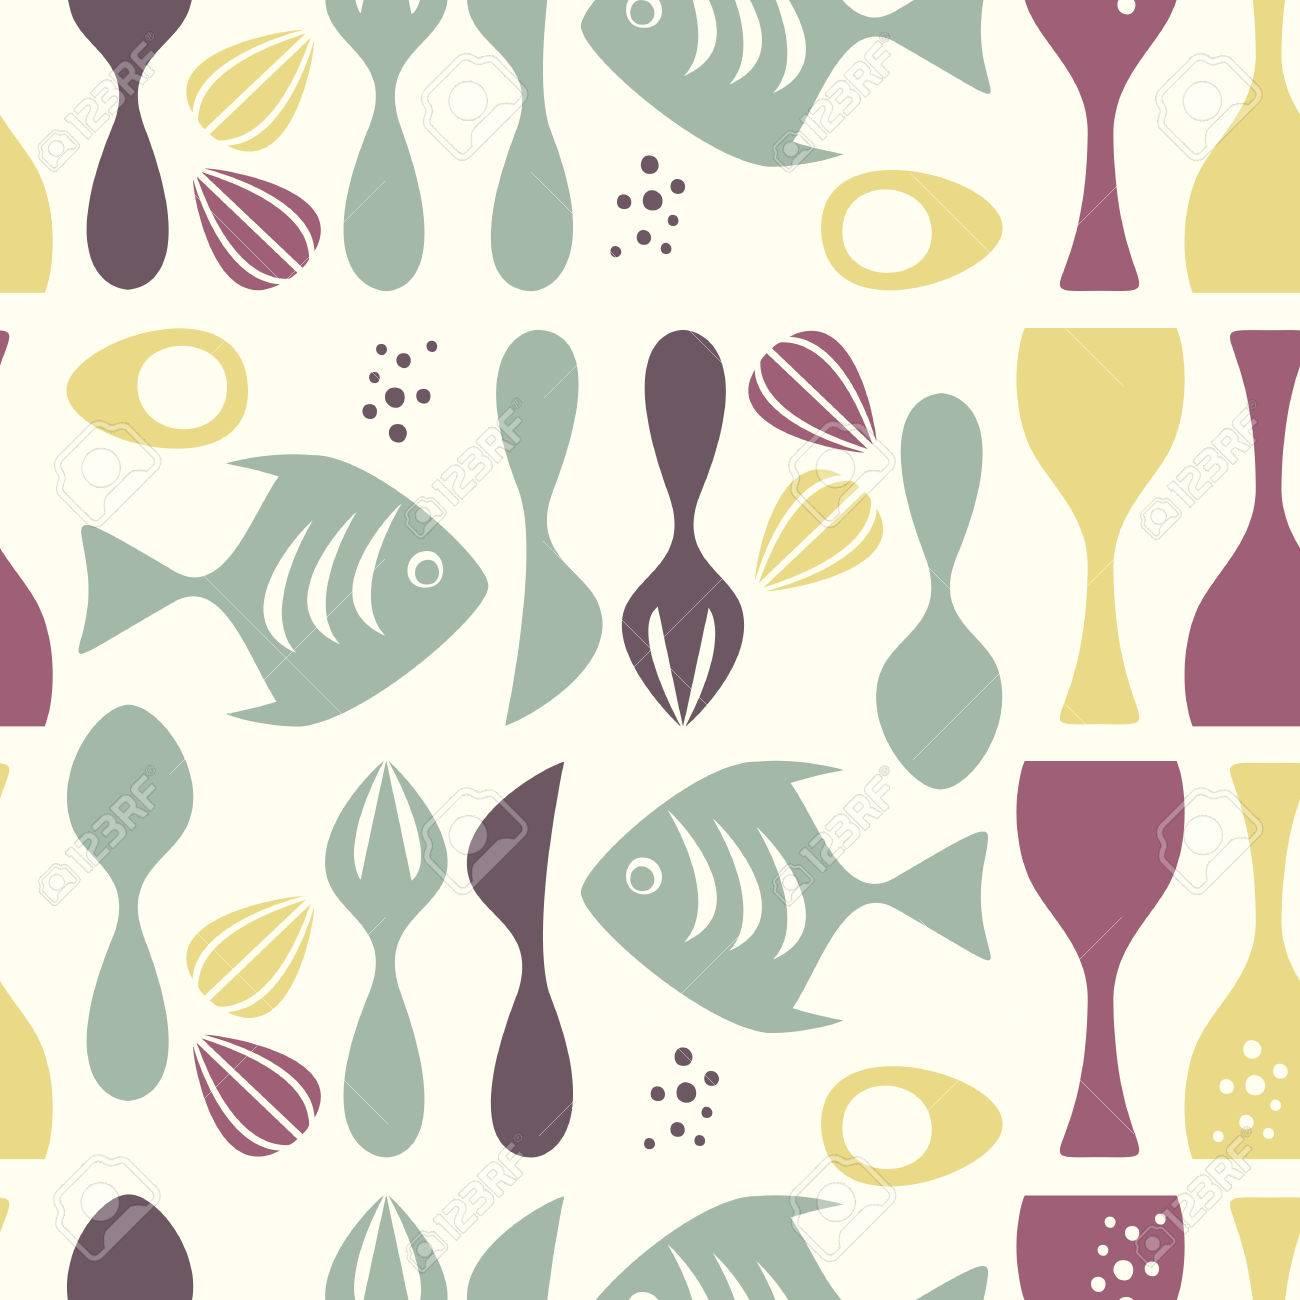 Kitchen wallpaper retro - Seamless Pattern Kitchen Retro Style Stock Vector 8506466